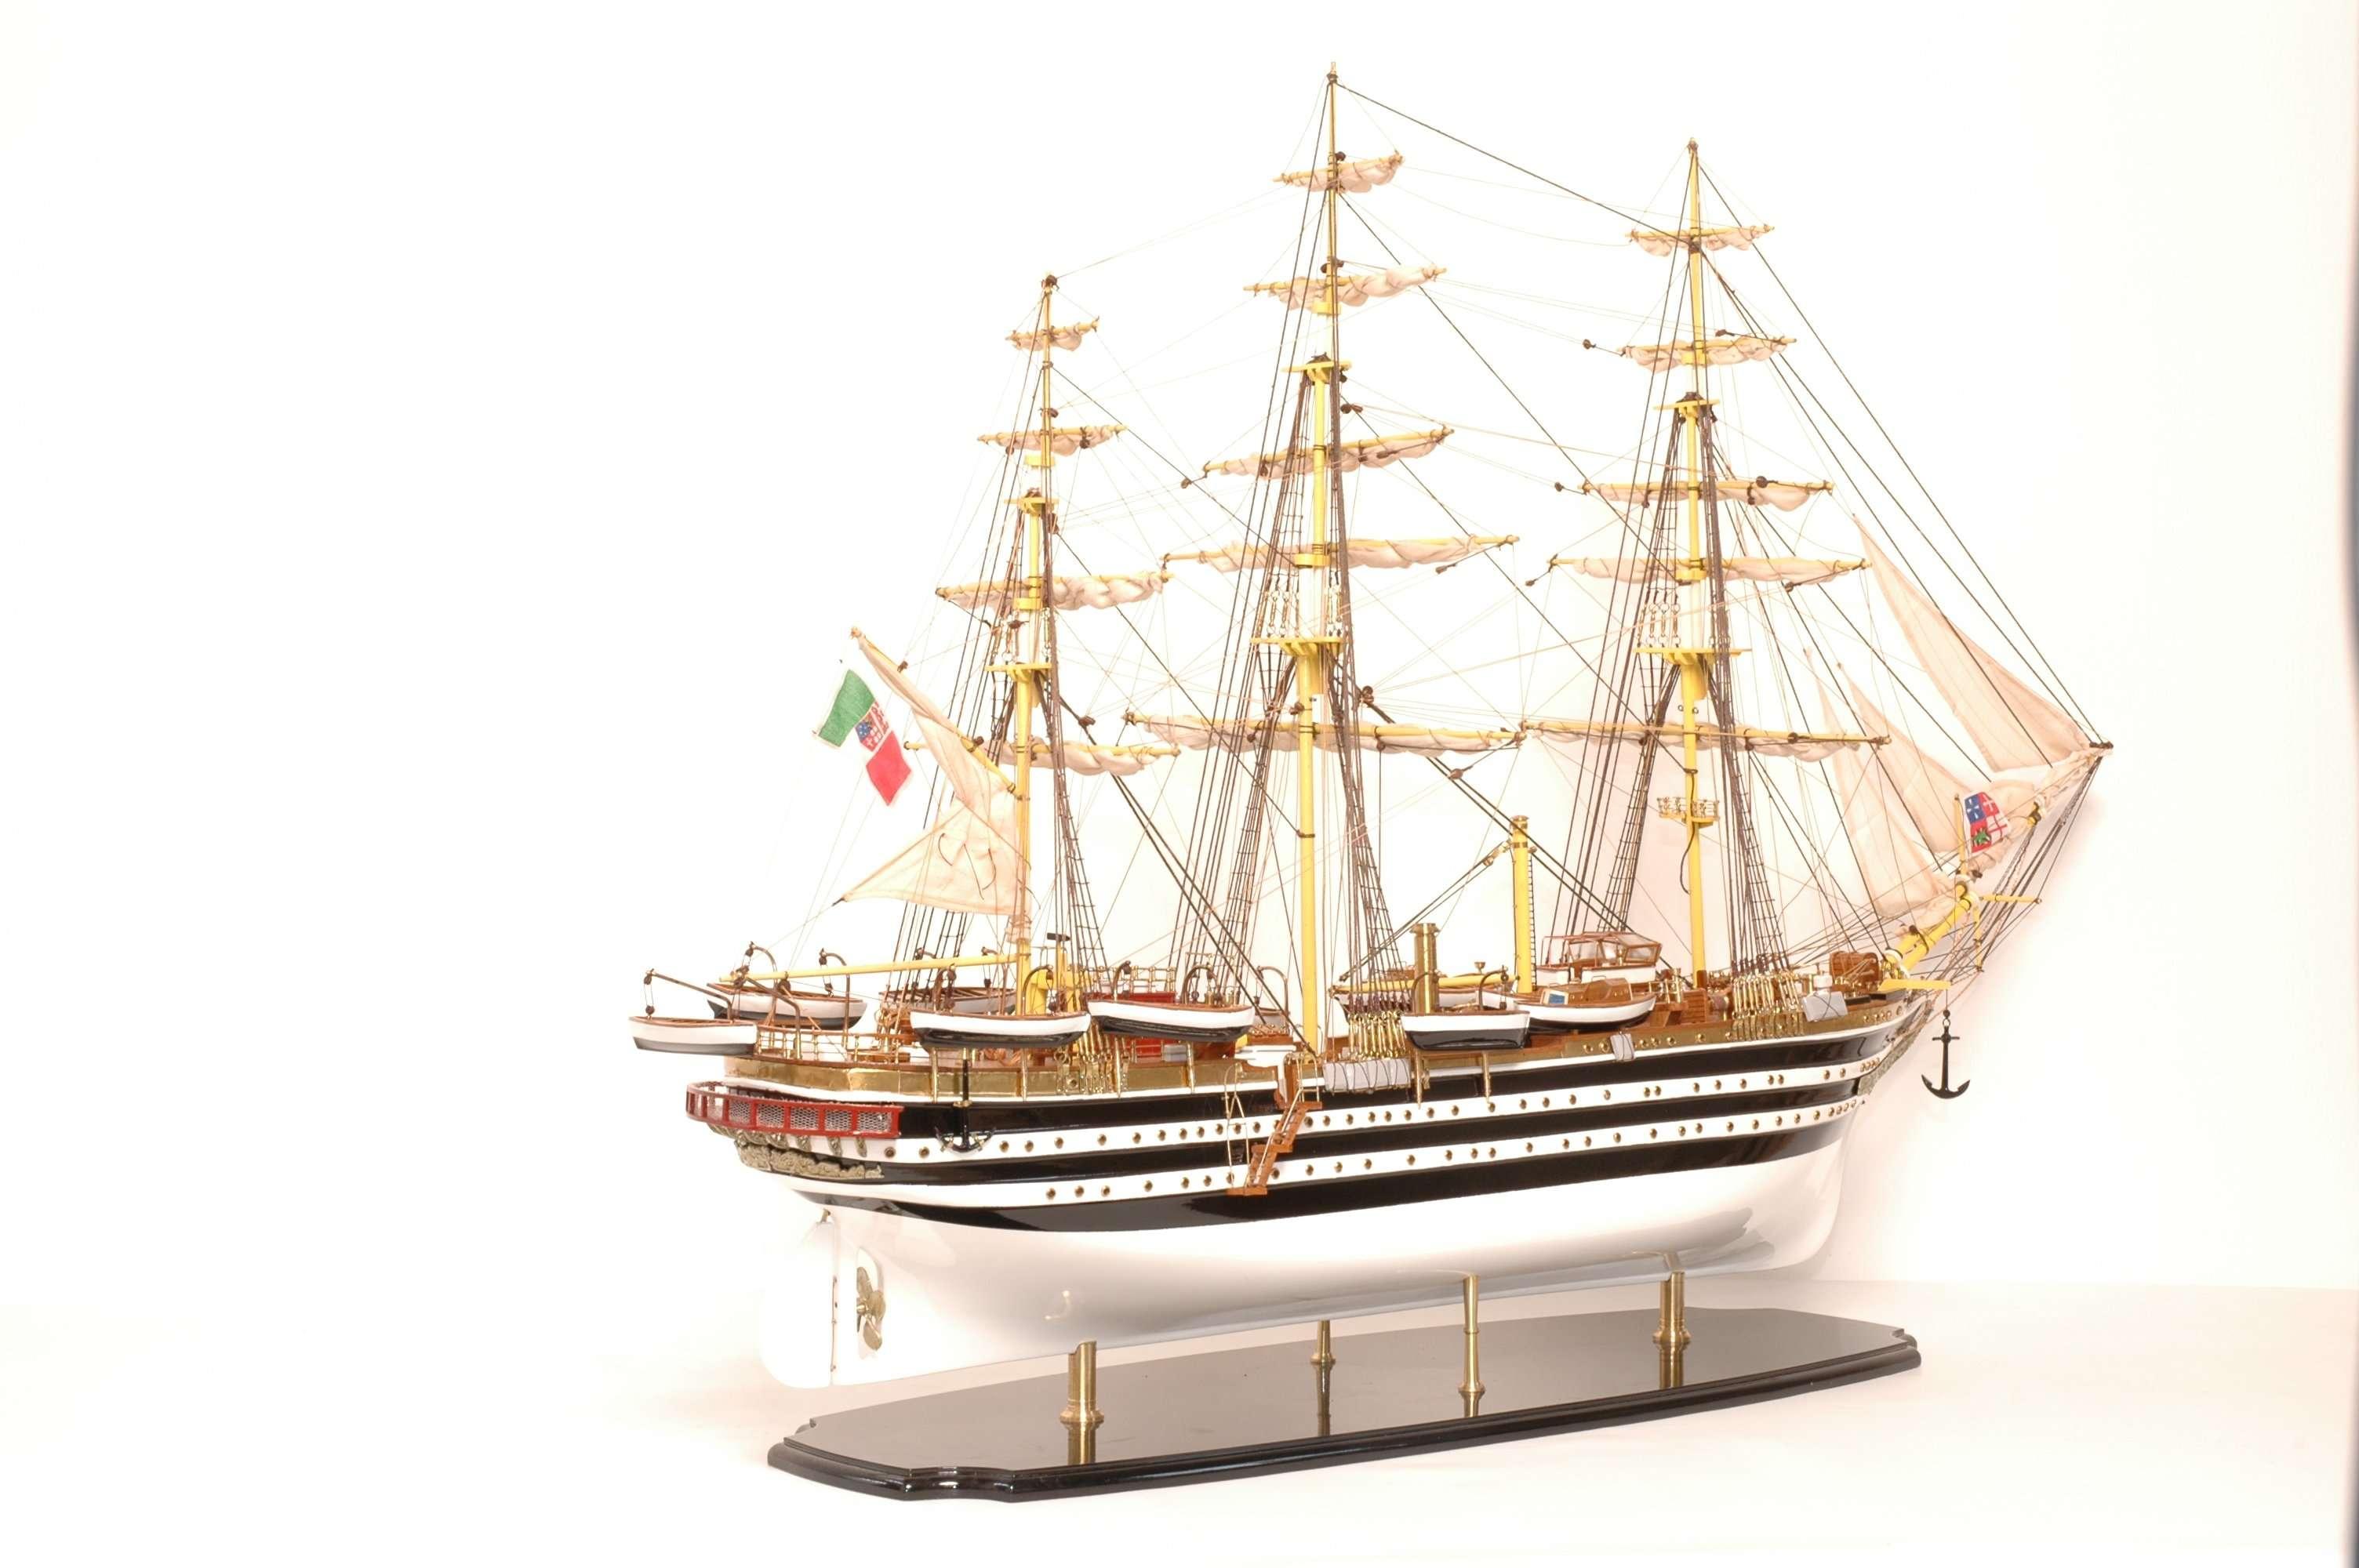 498-4212-Amerigo-Vespucci-Model-Ship-Superior-Range